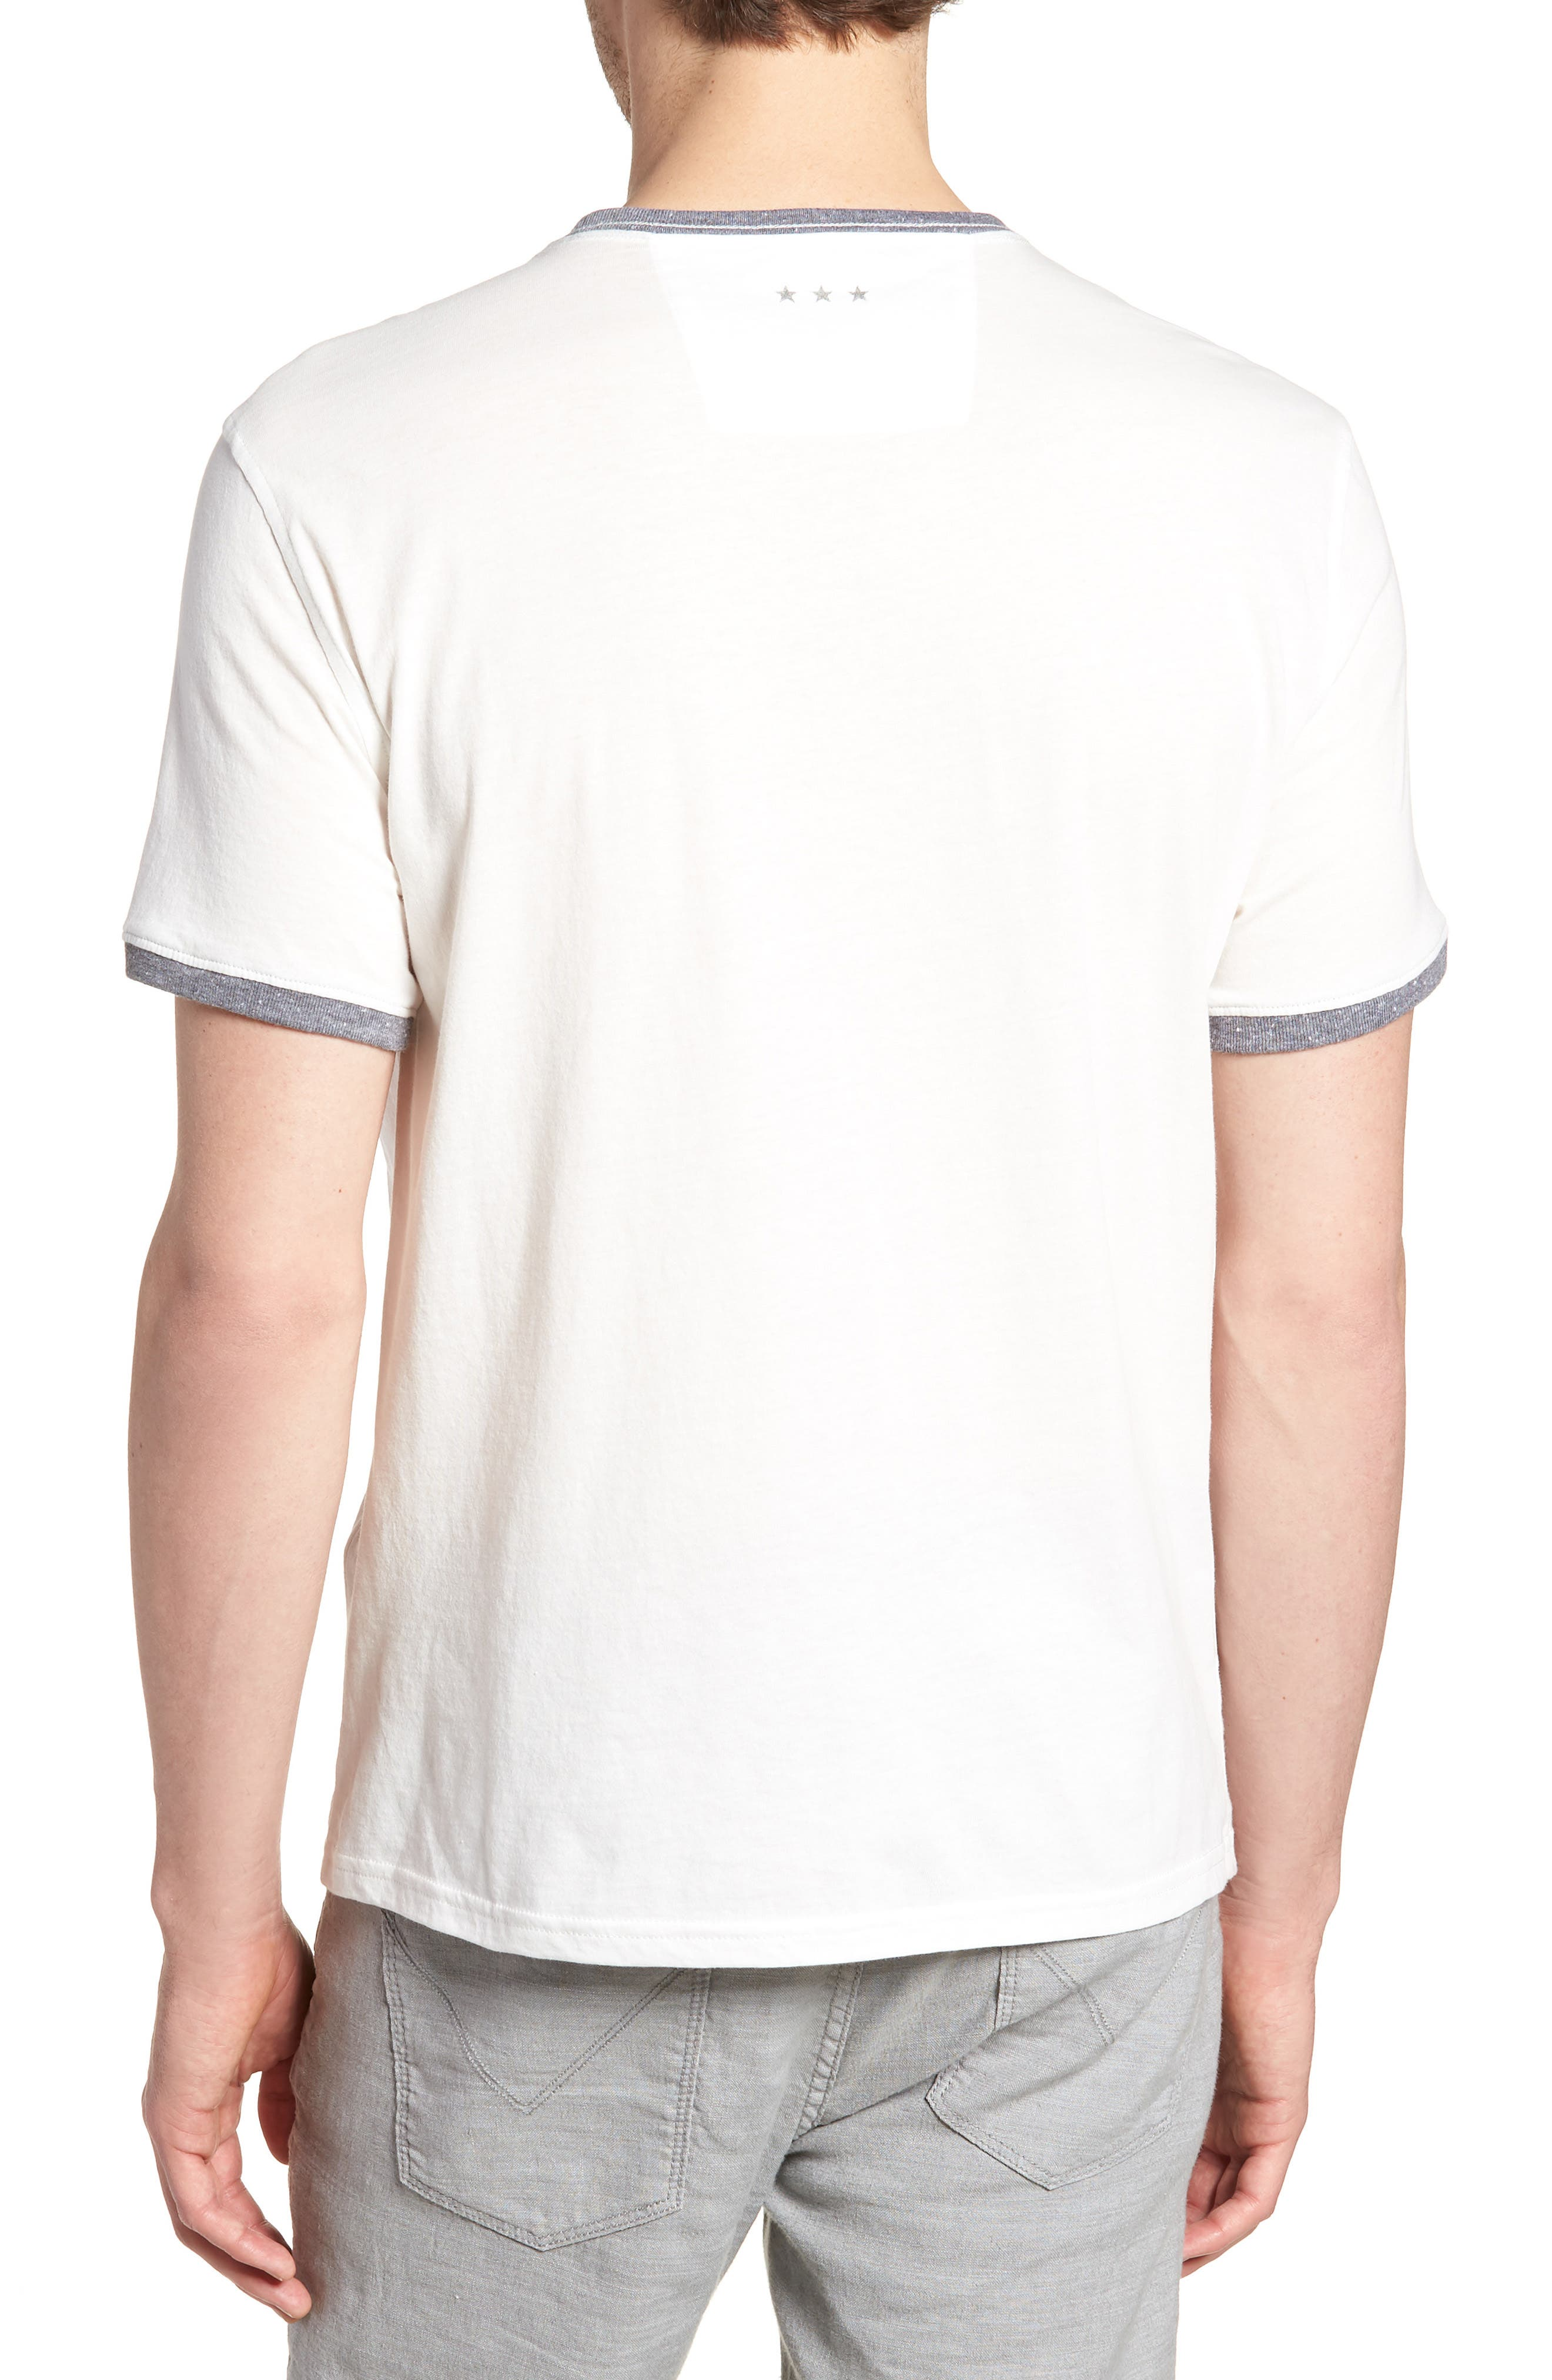 Liberty Shades Crewneck T-Shirt,                             Alternate thumbnail 2, color,                             103